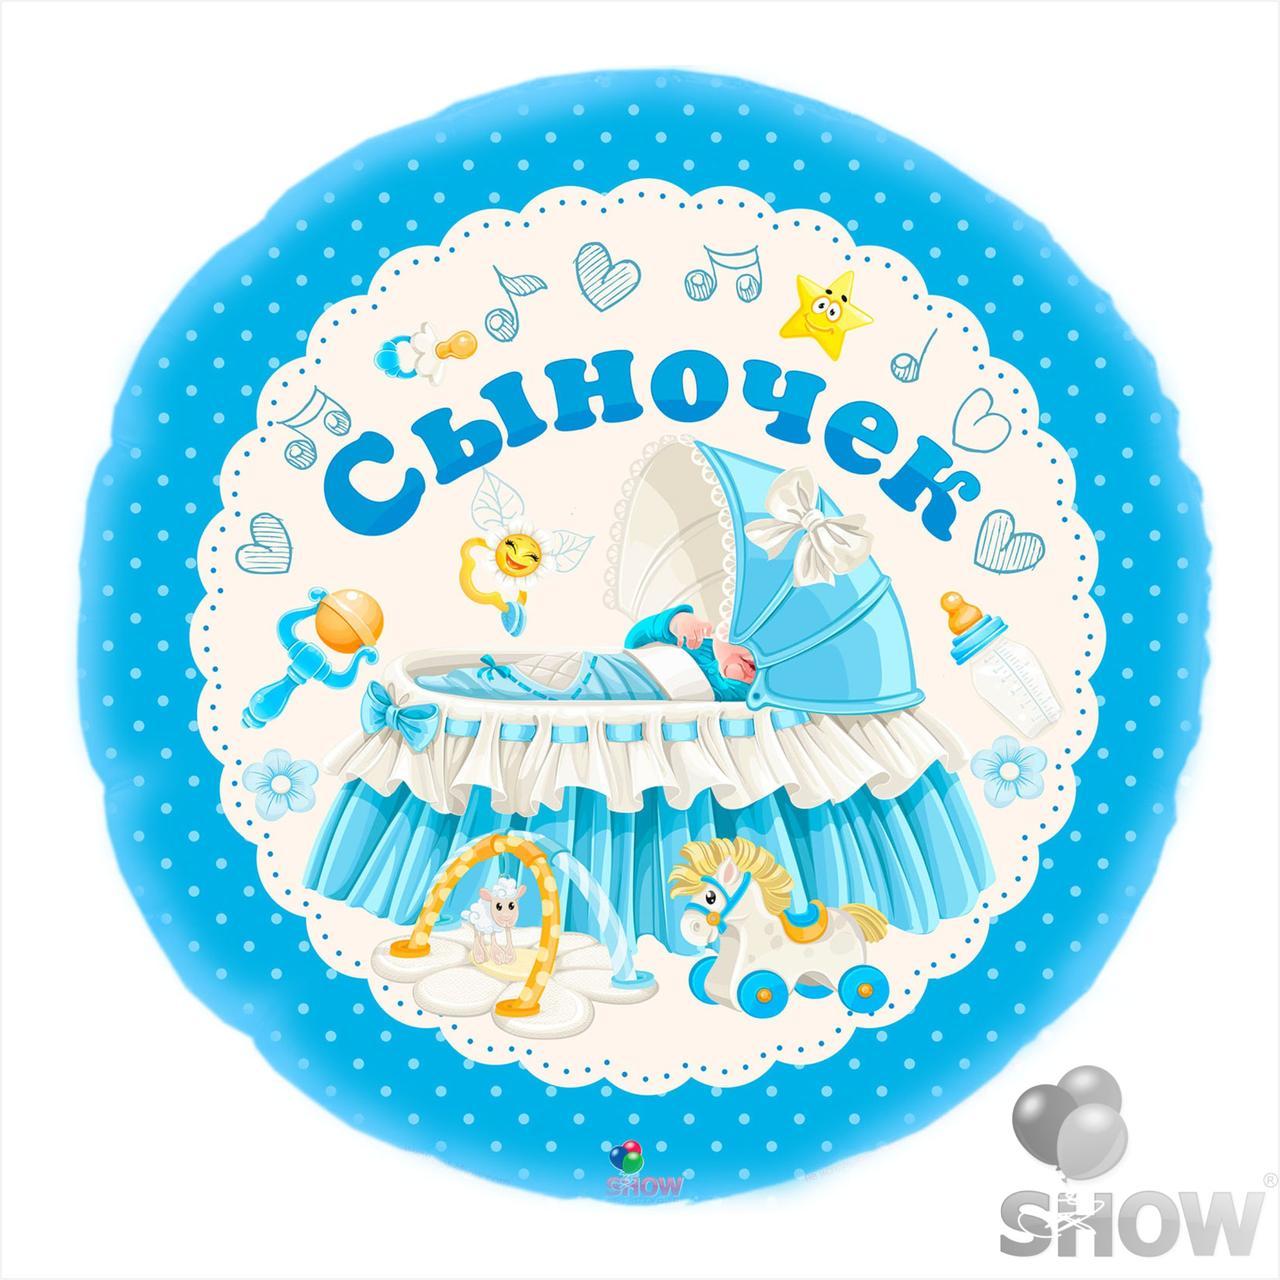 "Фол шар SHOW 18"" Круг Сыночек Голубой (АртШОУ)"